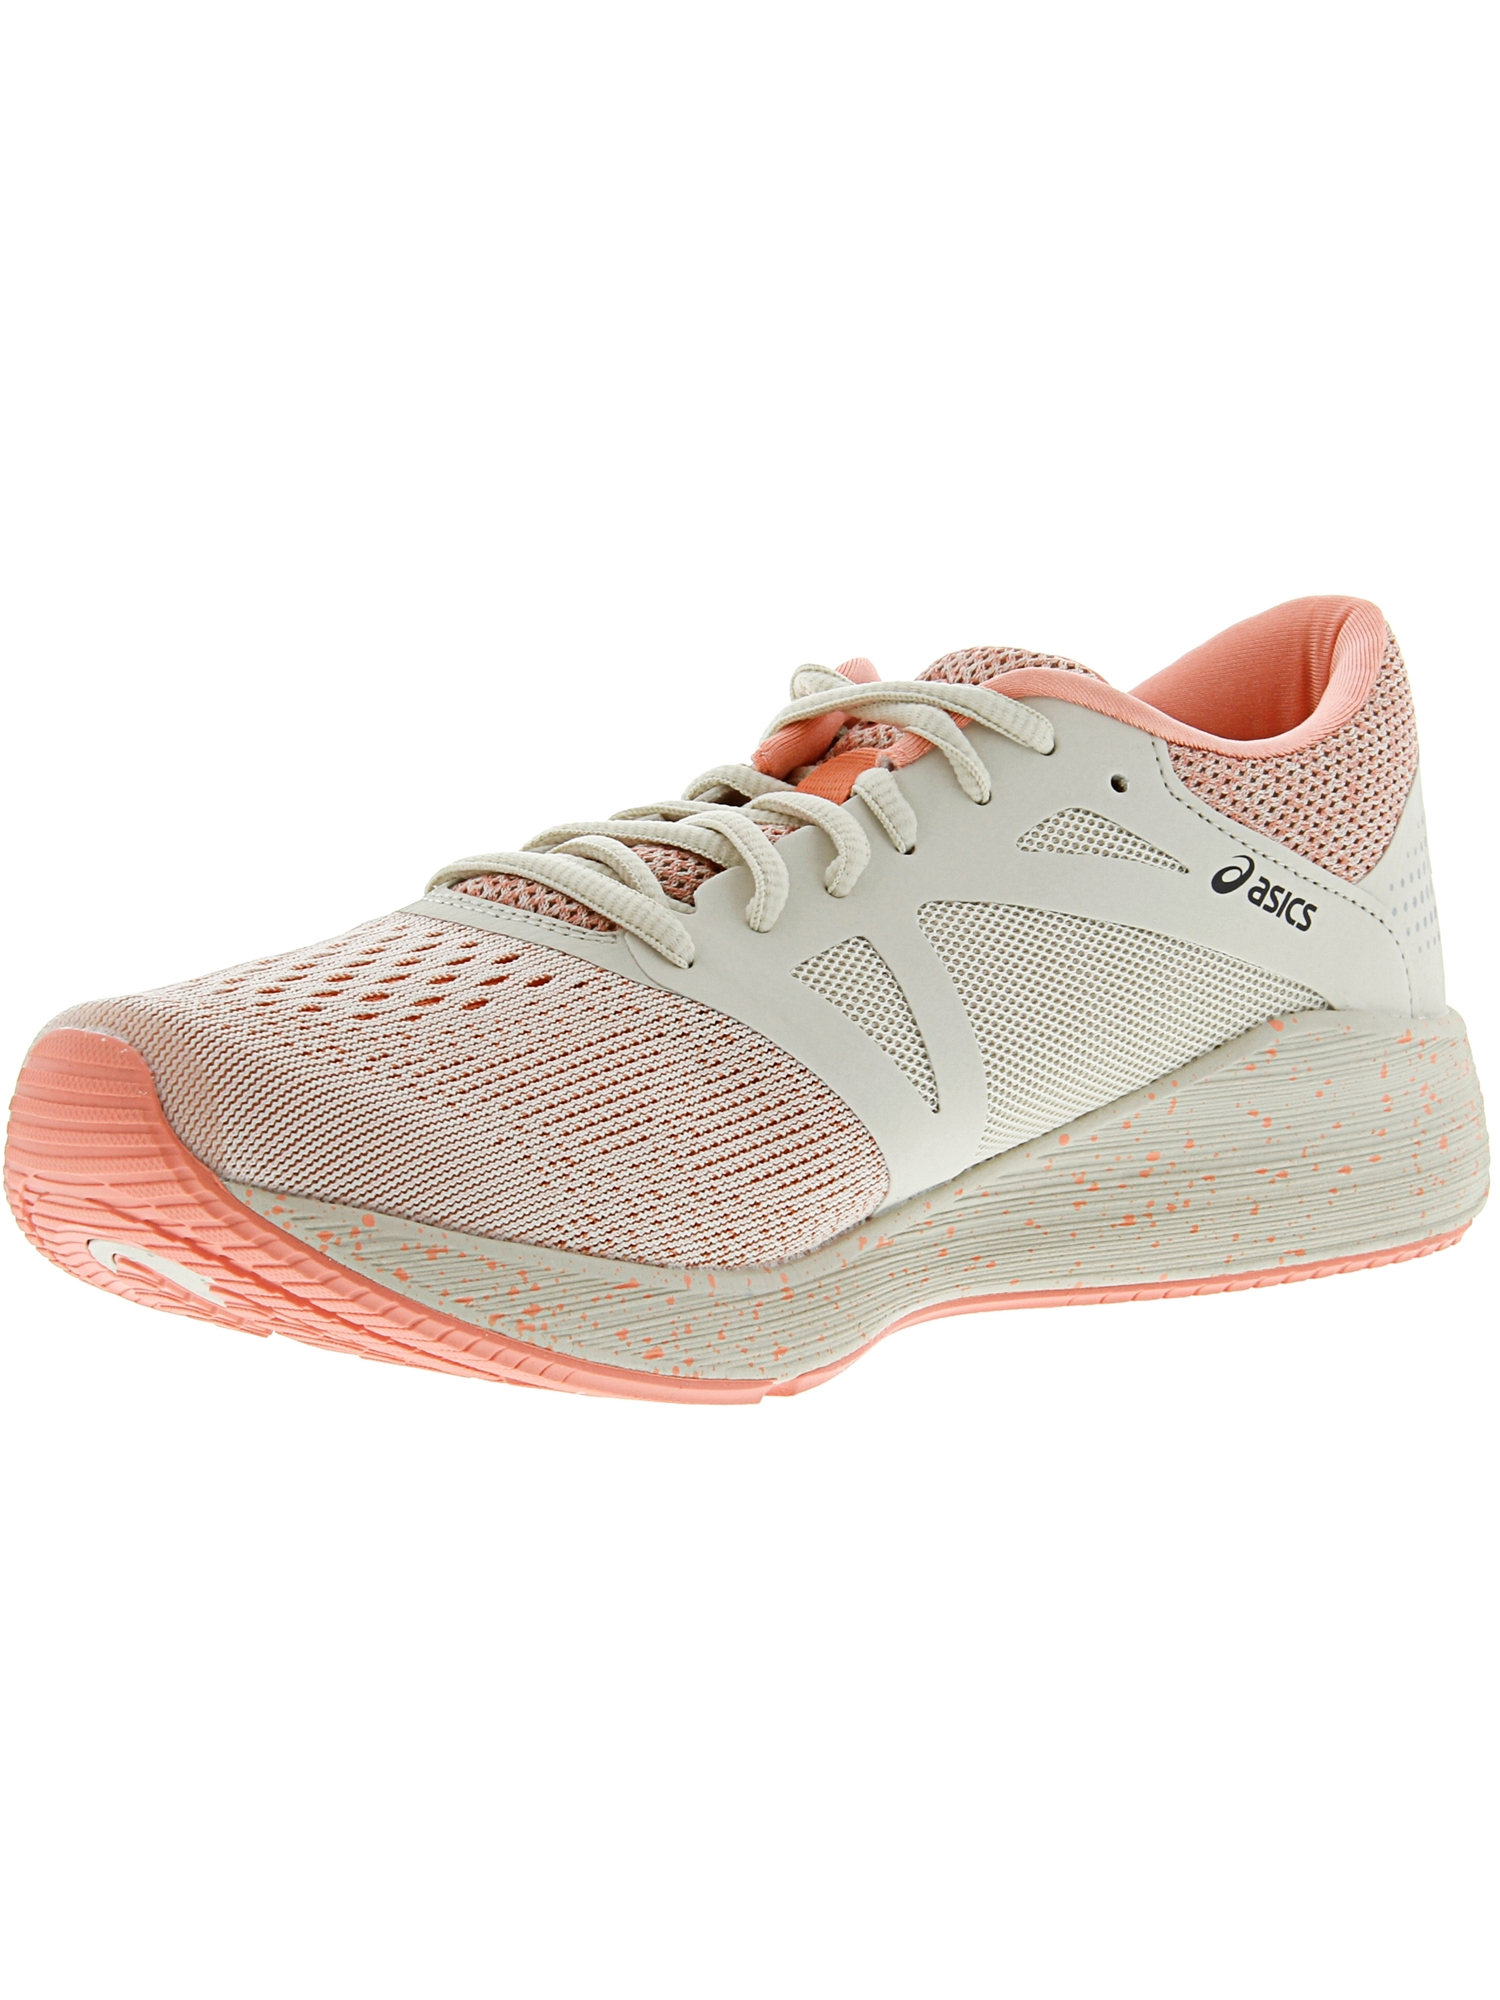 Asics Women's Roadhawk Ff Sp Cherry / Blossom Birch Ankle-High Running Shoe - 9M